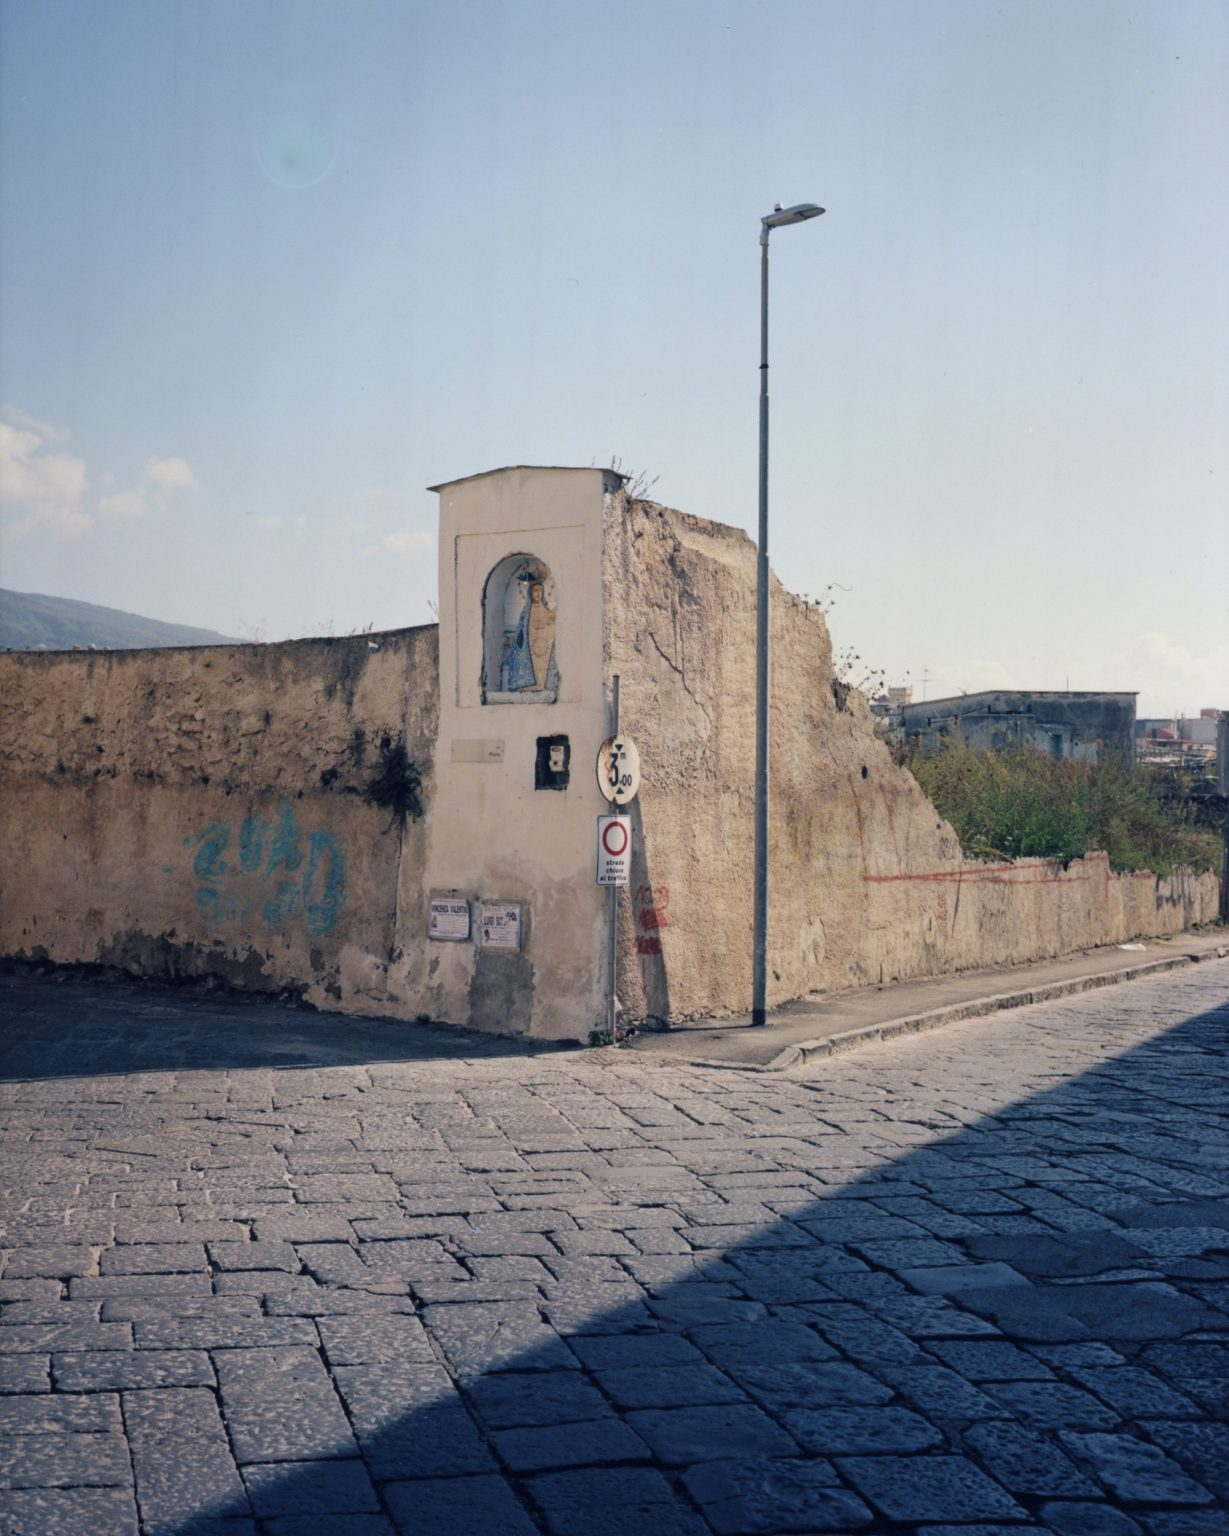 Sacred shrine, intersection. Paesi Vesuviani, Province of Naples. 2020